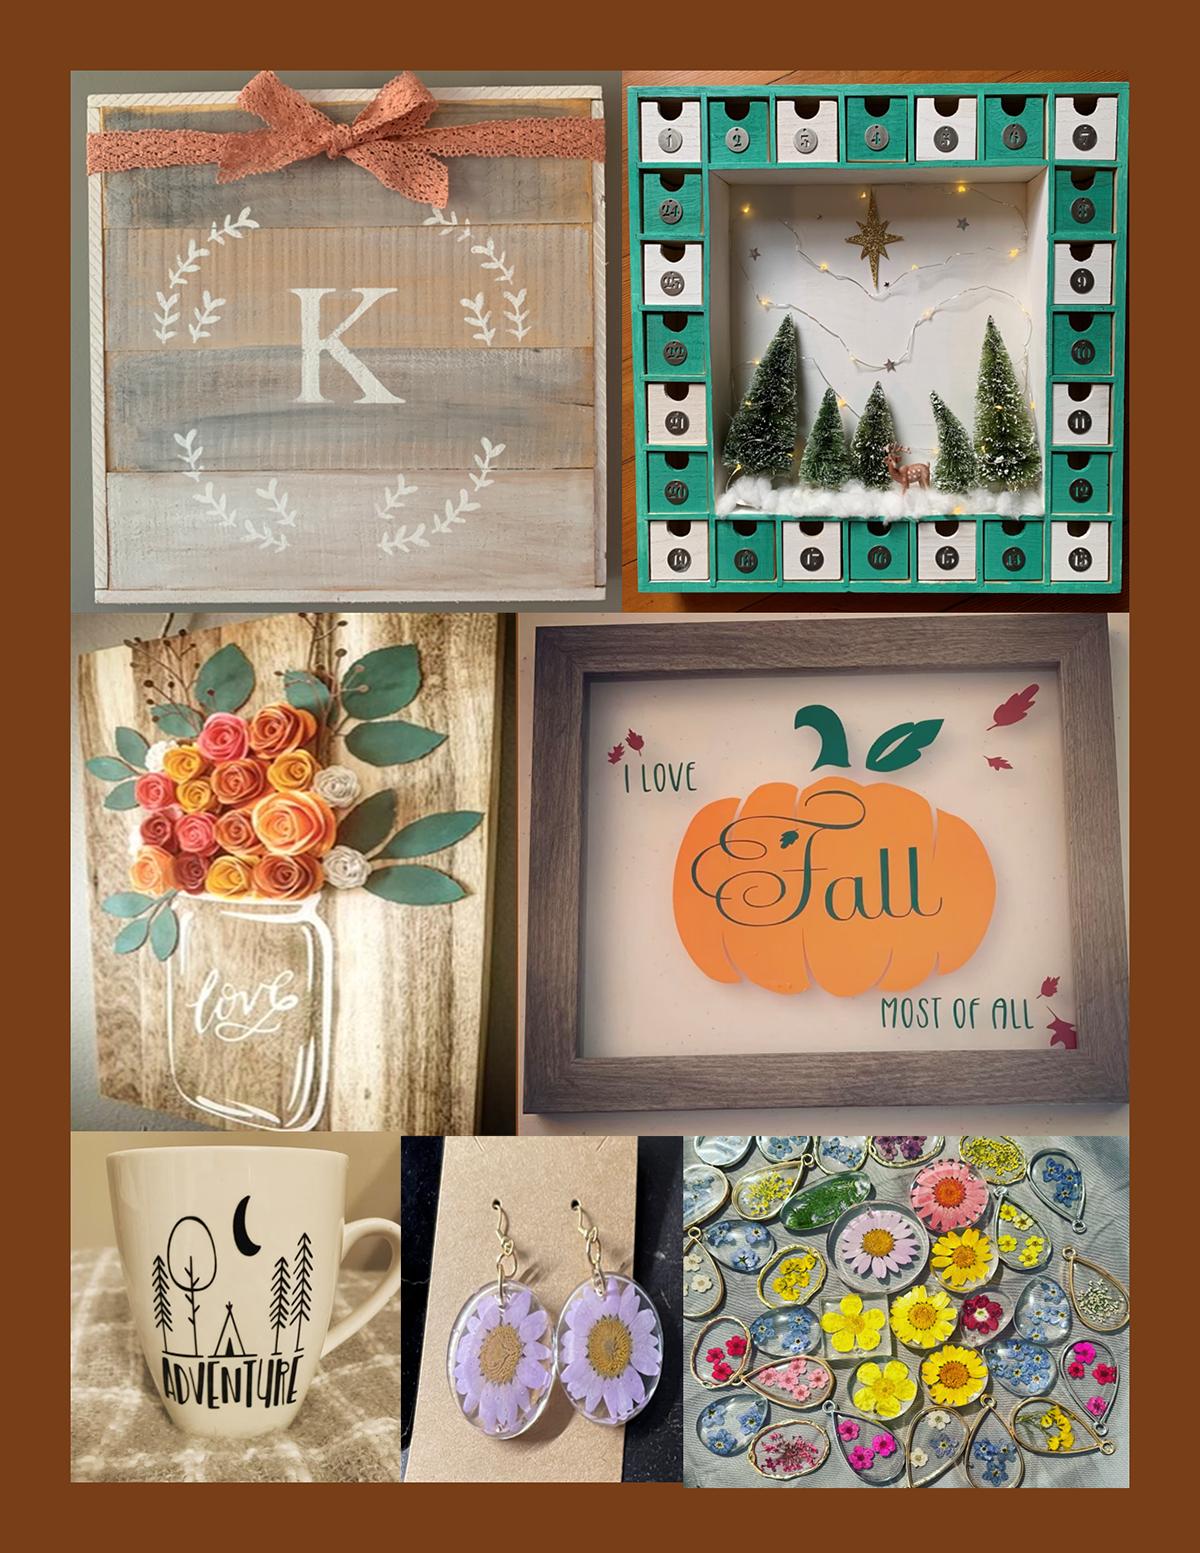 mandi & meg's handcrafted items